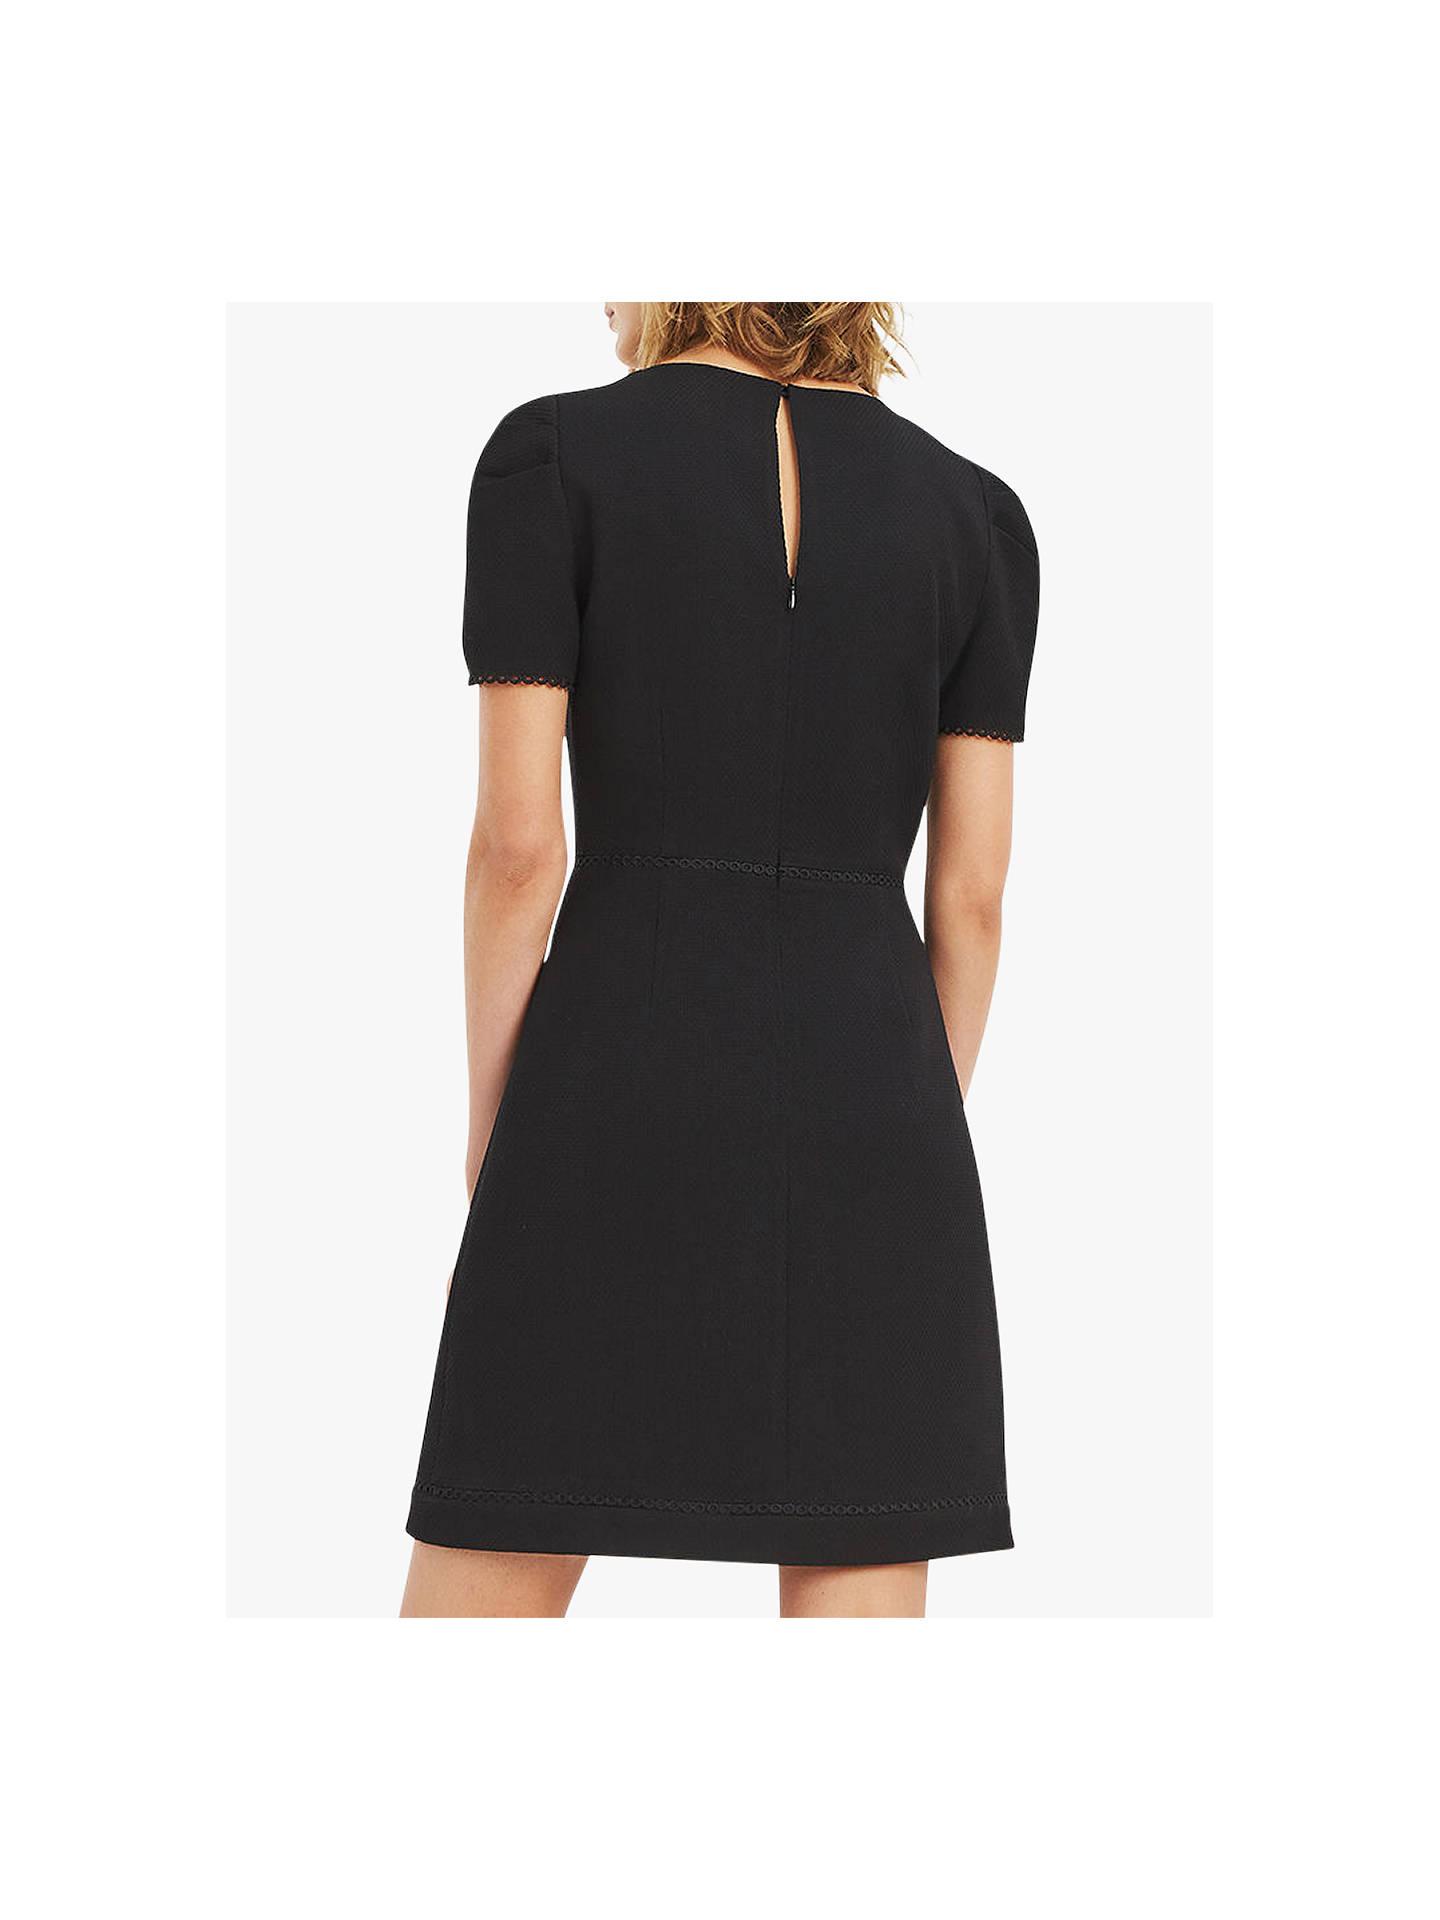 902a0653d2ce ... Buy Oasis Circle Trim Dress, Black, 6 Online at johnlewis.com ...